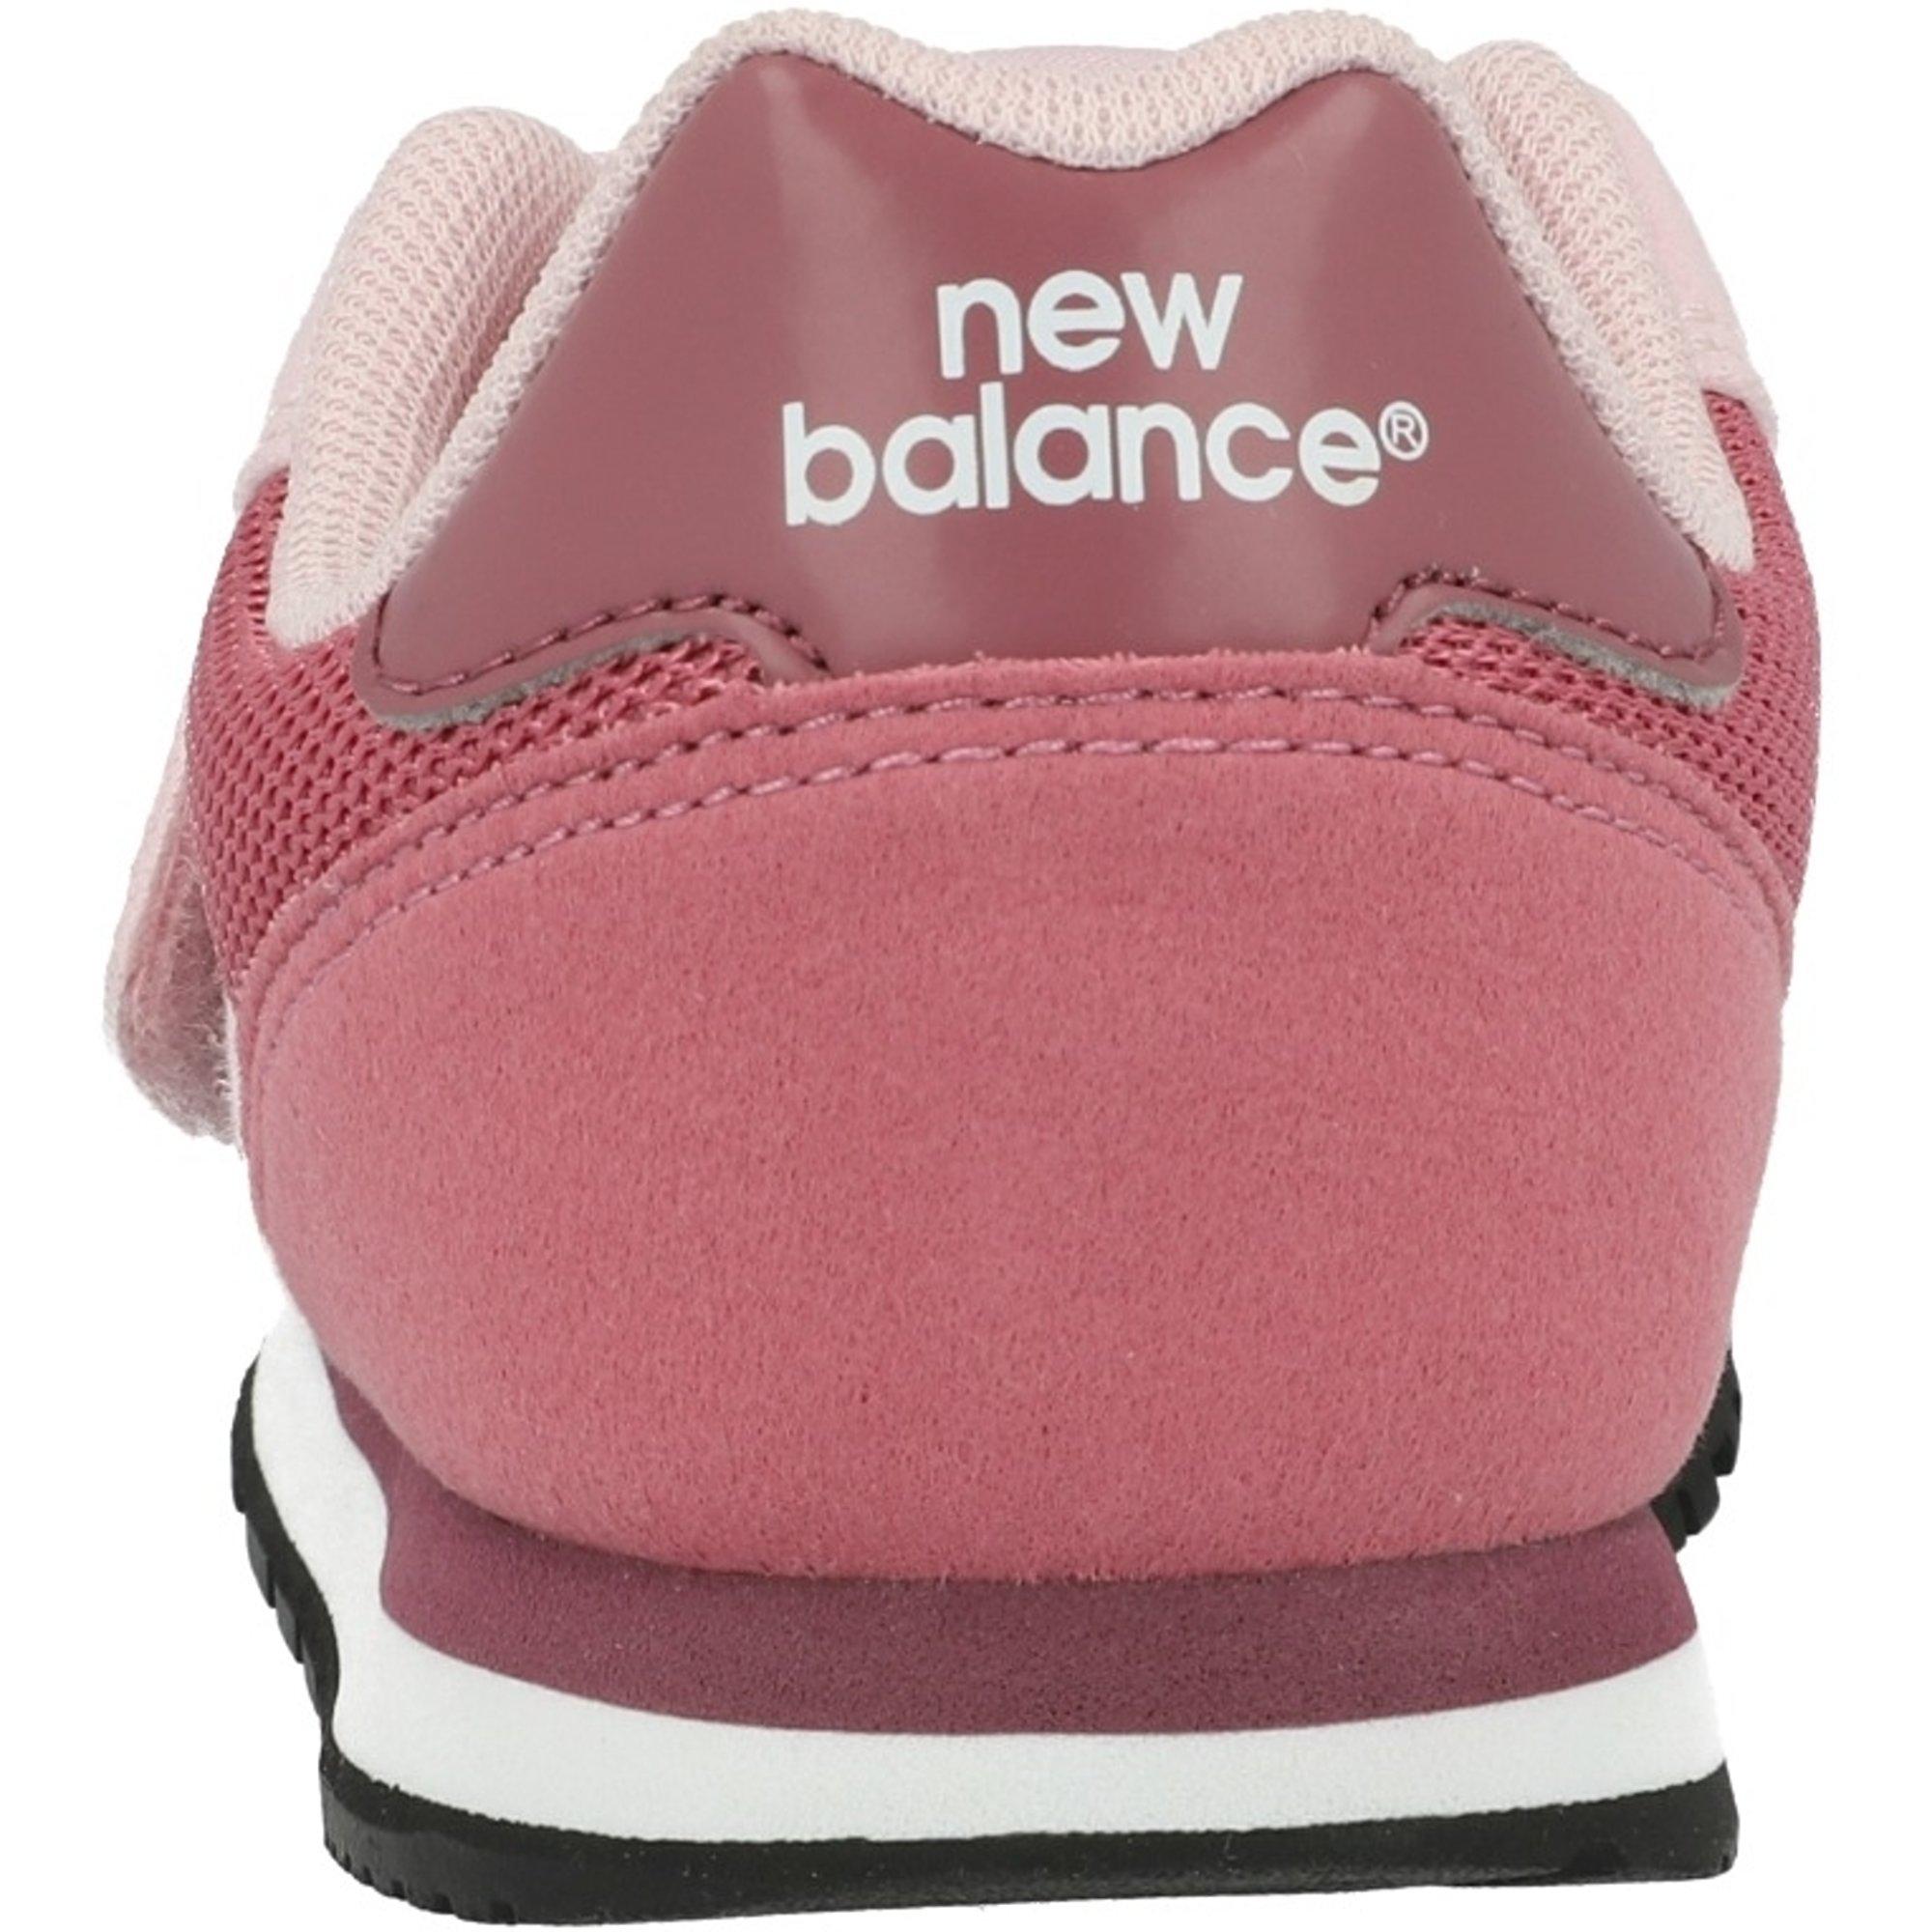 new balance 373 rose